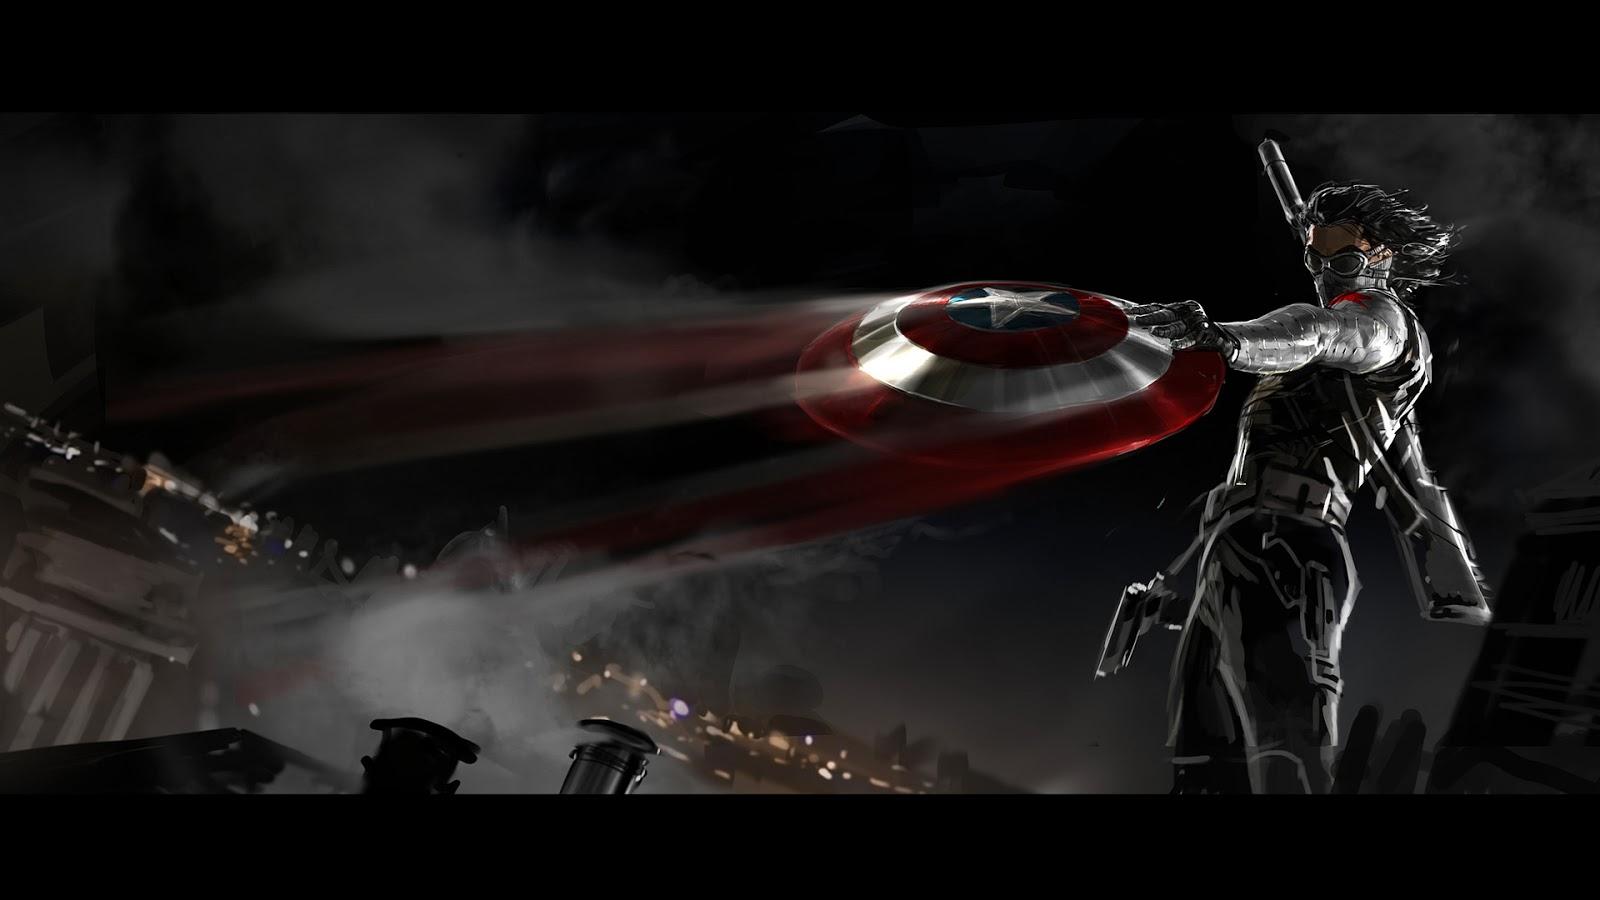 captain america 2 the winter soldier 2014 movie hd wallpaper 1920x1080 1600x900